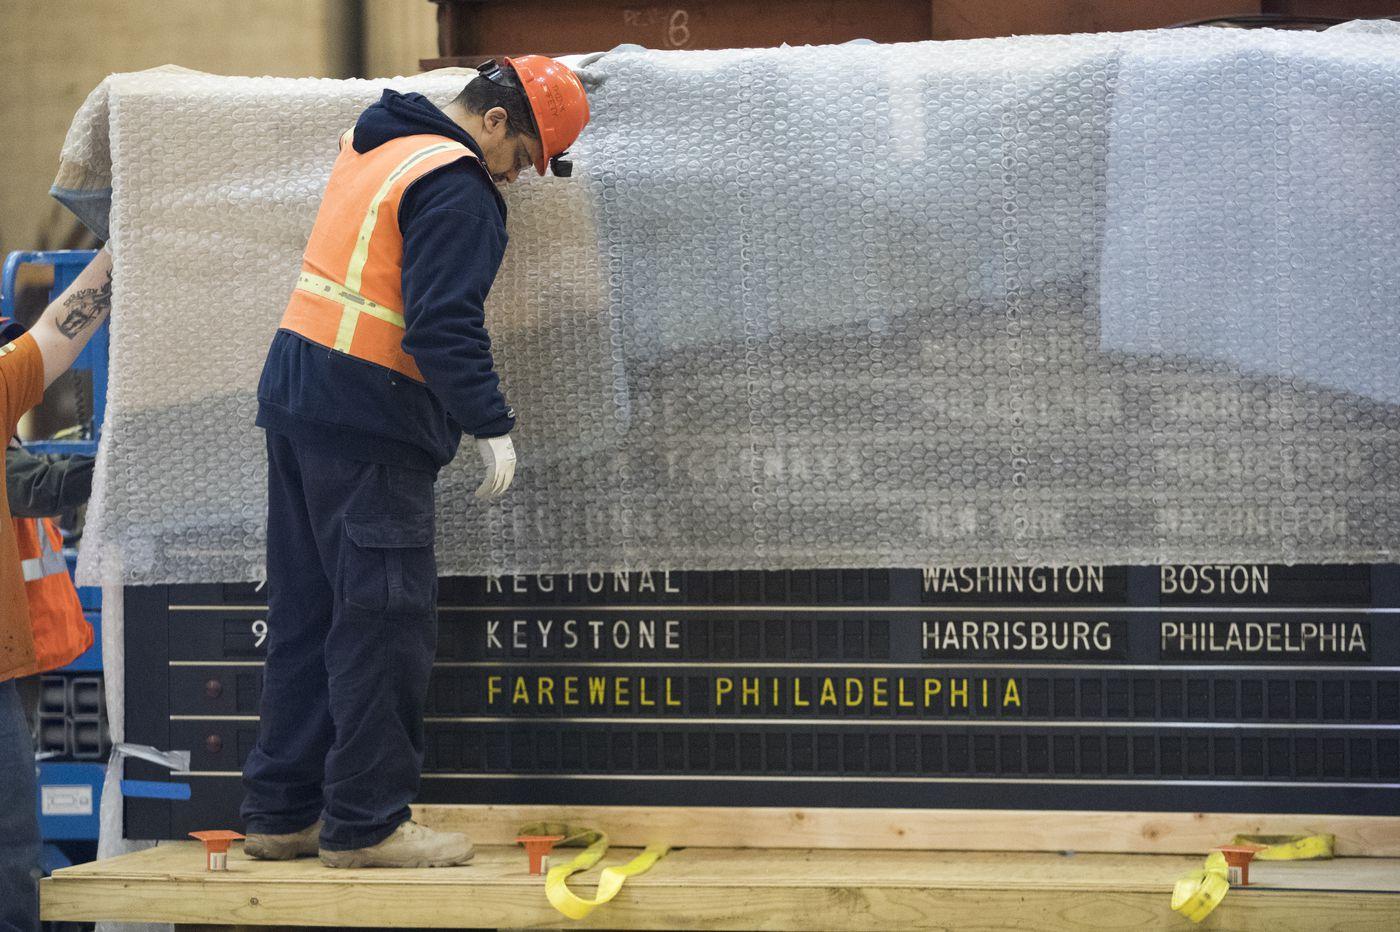 Philadelphia says goodbye to its iconic 30th Street Station